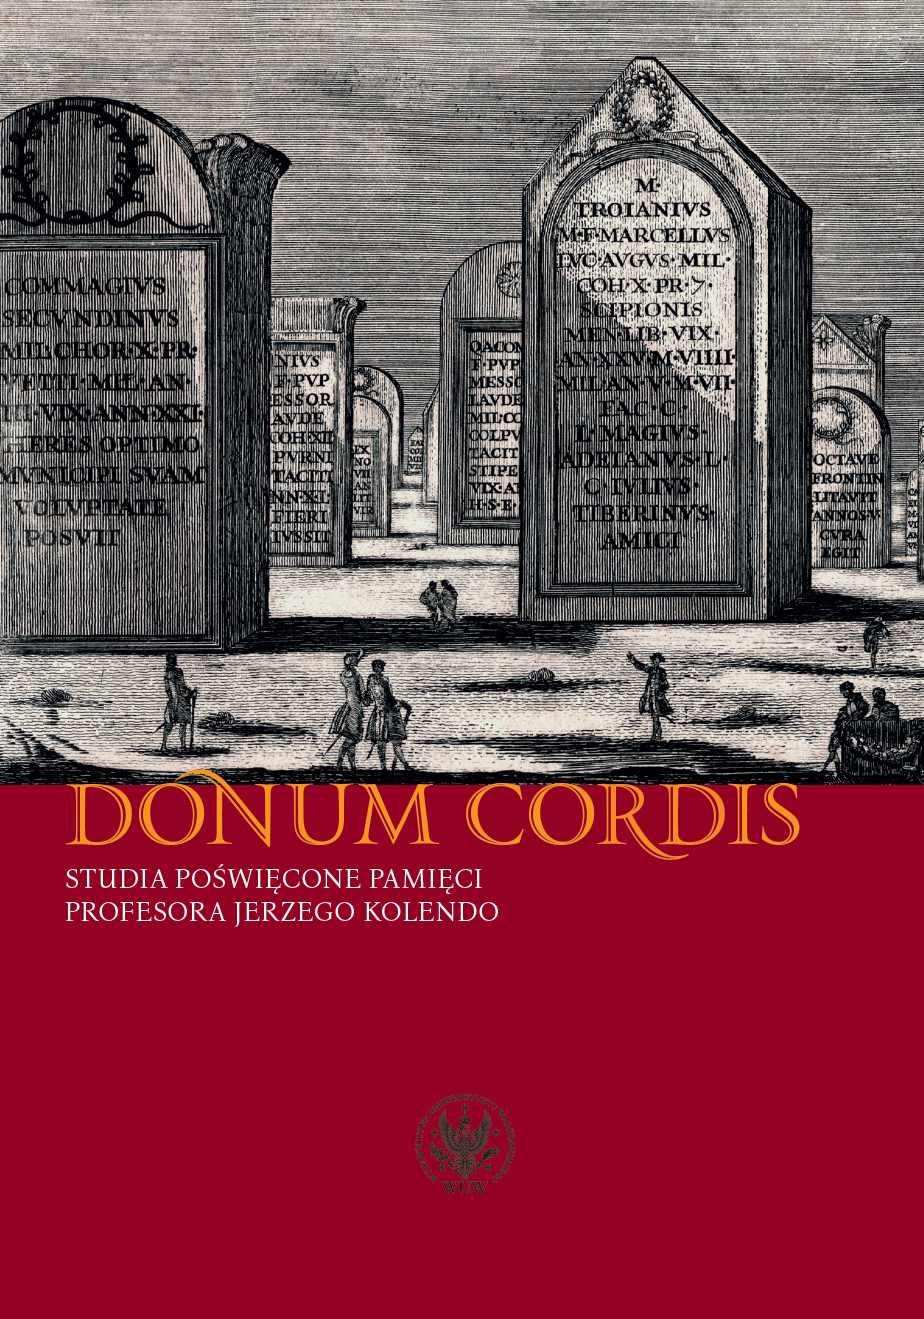 Donum cordis - Ebook (Książka na Kindle) do pobrania w formacie MOBI